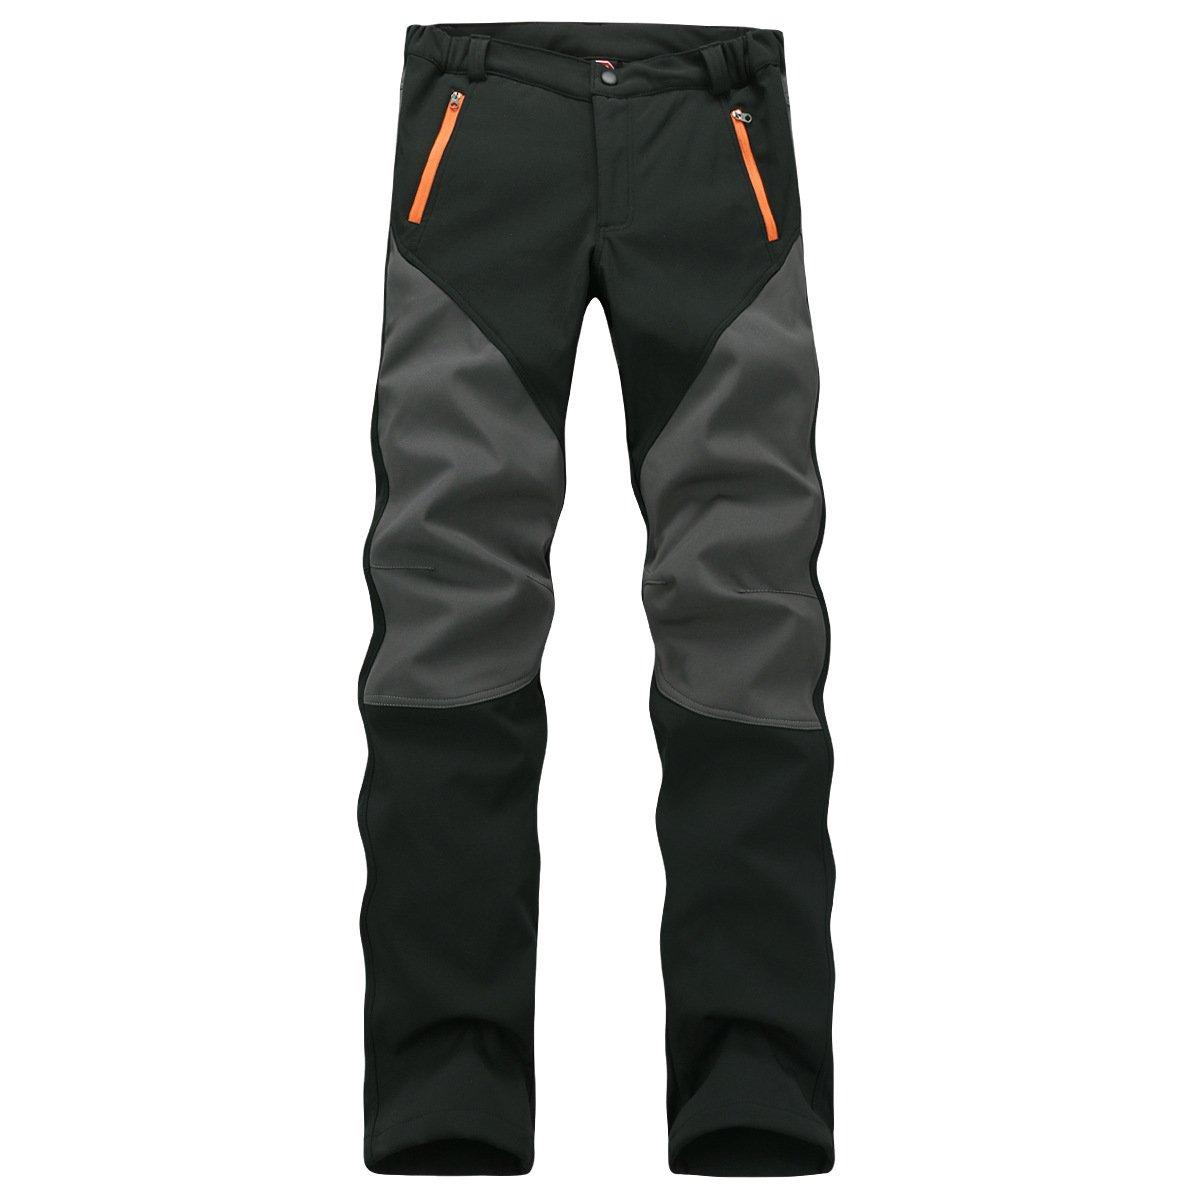 Ynport Windproof Softshell Tracksuits Winter Trekking Fleece Ski Hiking Pants 180823-01